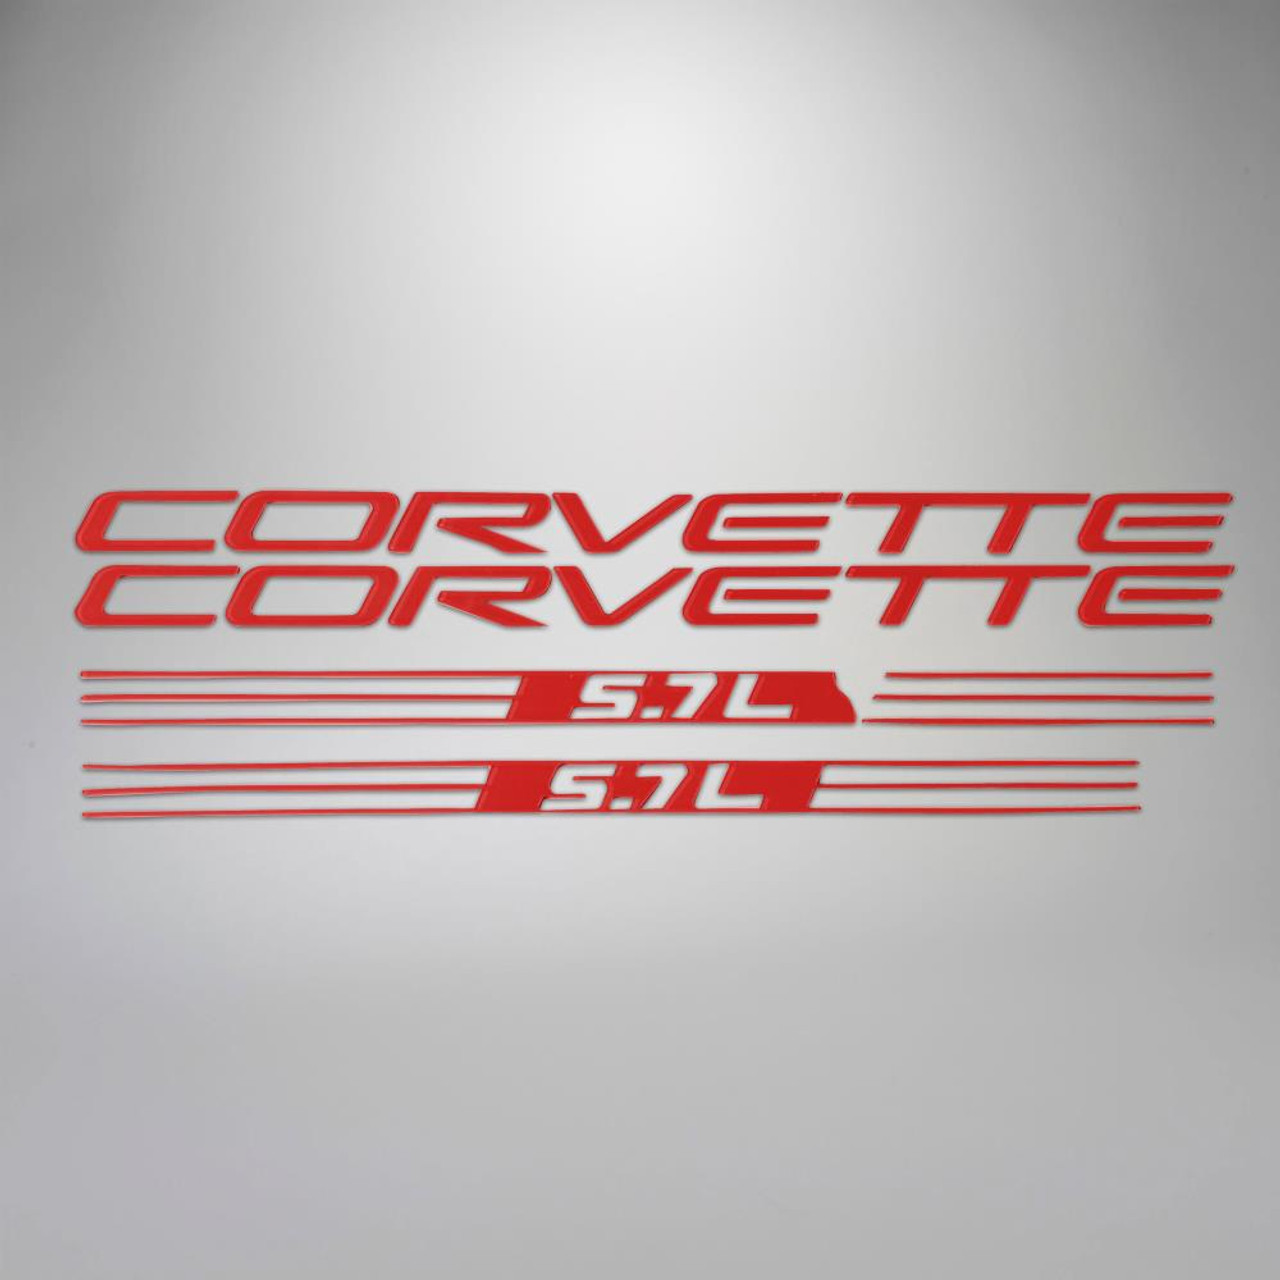 C5 99-04 Corvette 5.7L Fuel Rail Letter Kit - Red